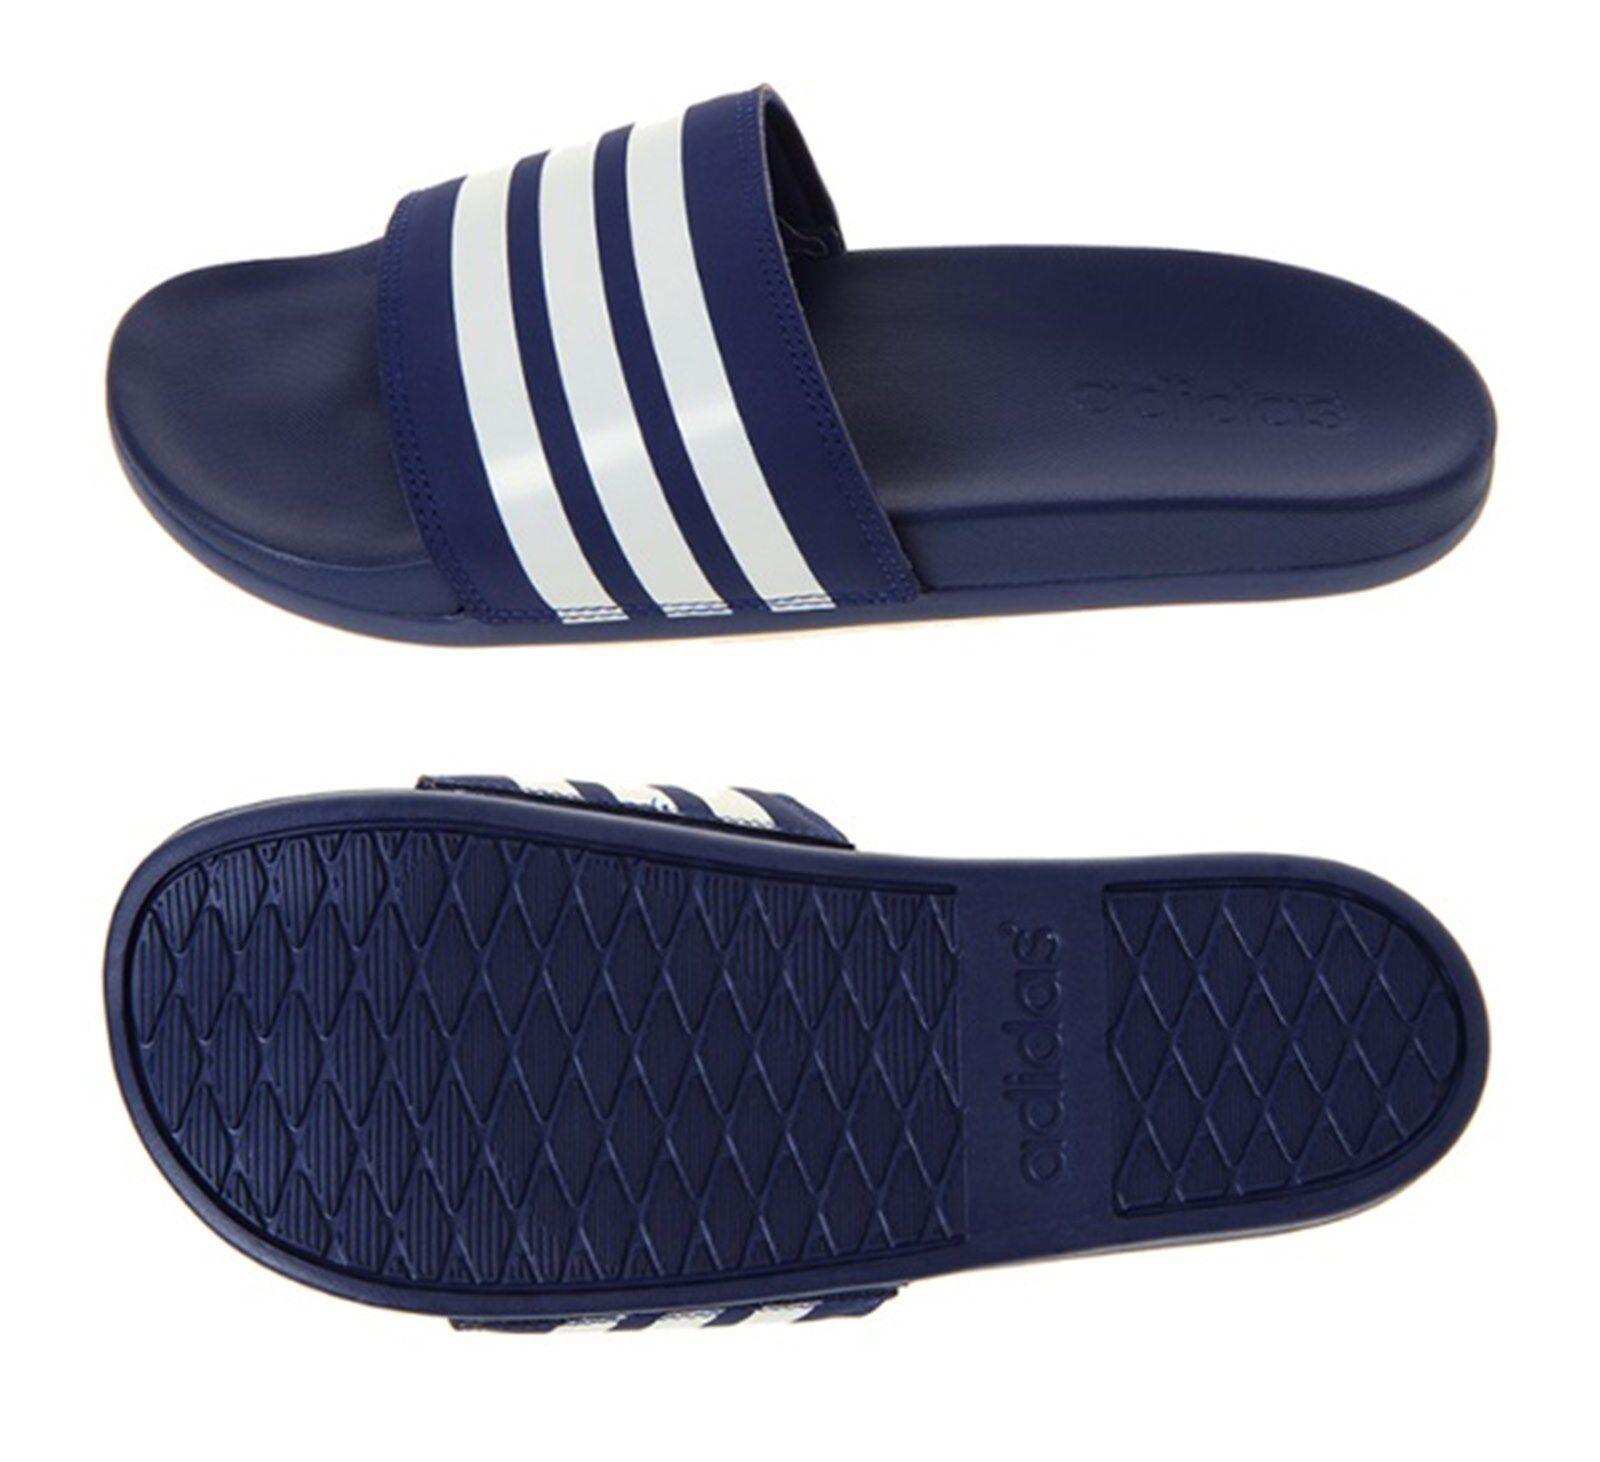 "Adidas Ανδρικά Adilette CF 3-Stripes ΞΞ±Ξ½Ο""ΟŒΟ†Ξ»Ξ΅Ο' Ναυτικά Παπούτσια Παραλία Slide B42114"